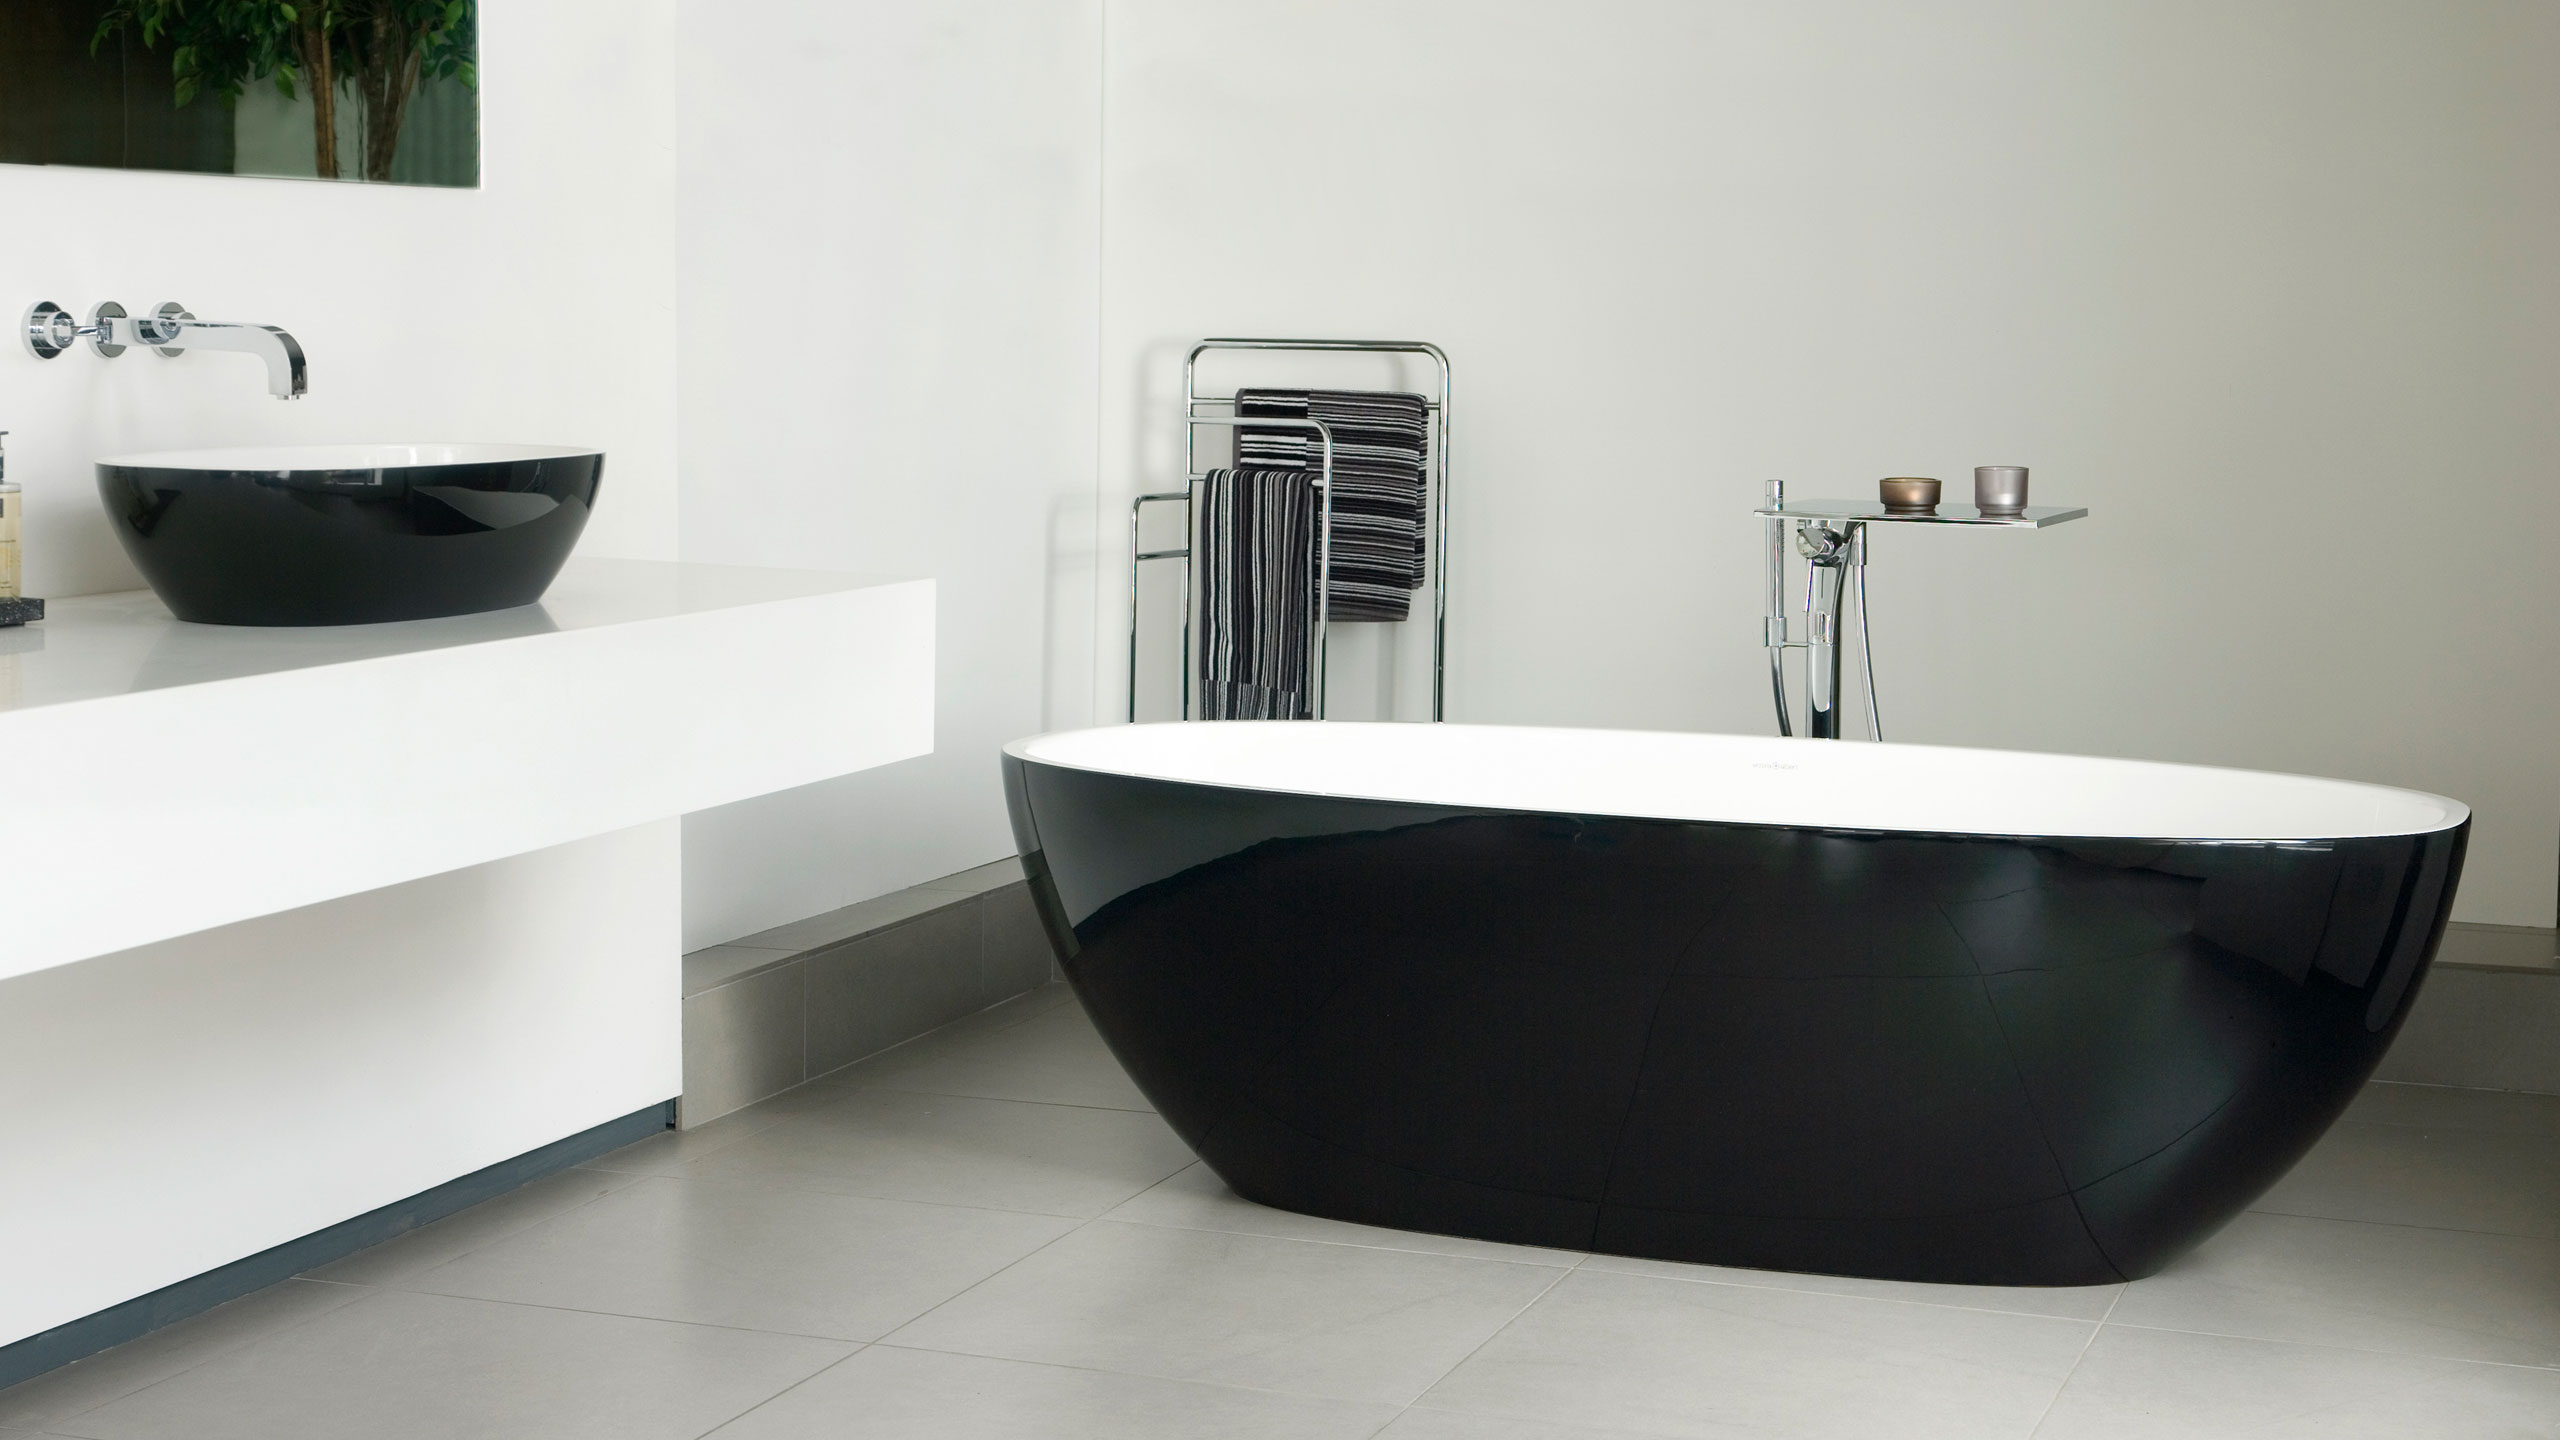 https://designerpages.s3.amazonaws.com/assets/61000131/Barcelona_Gallery_3black_EU.jpg